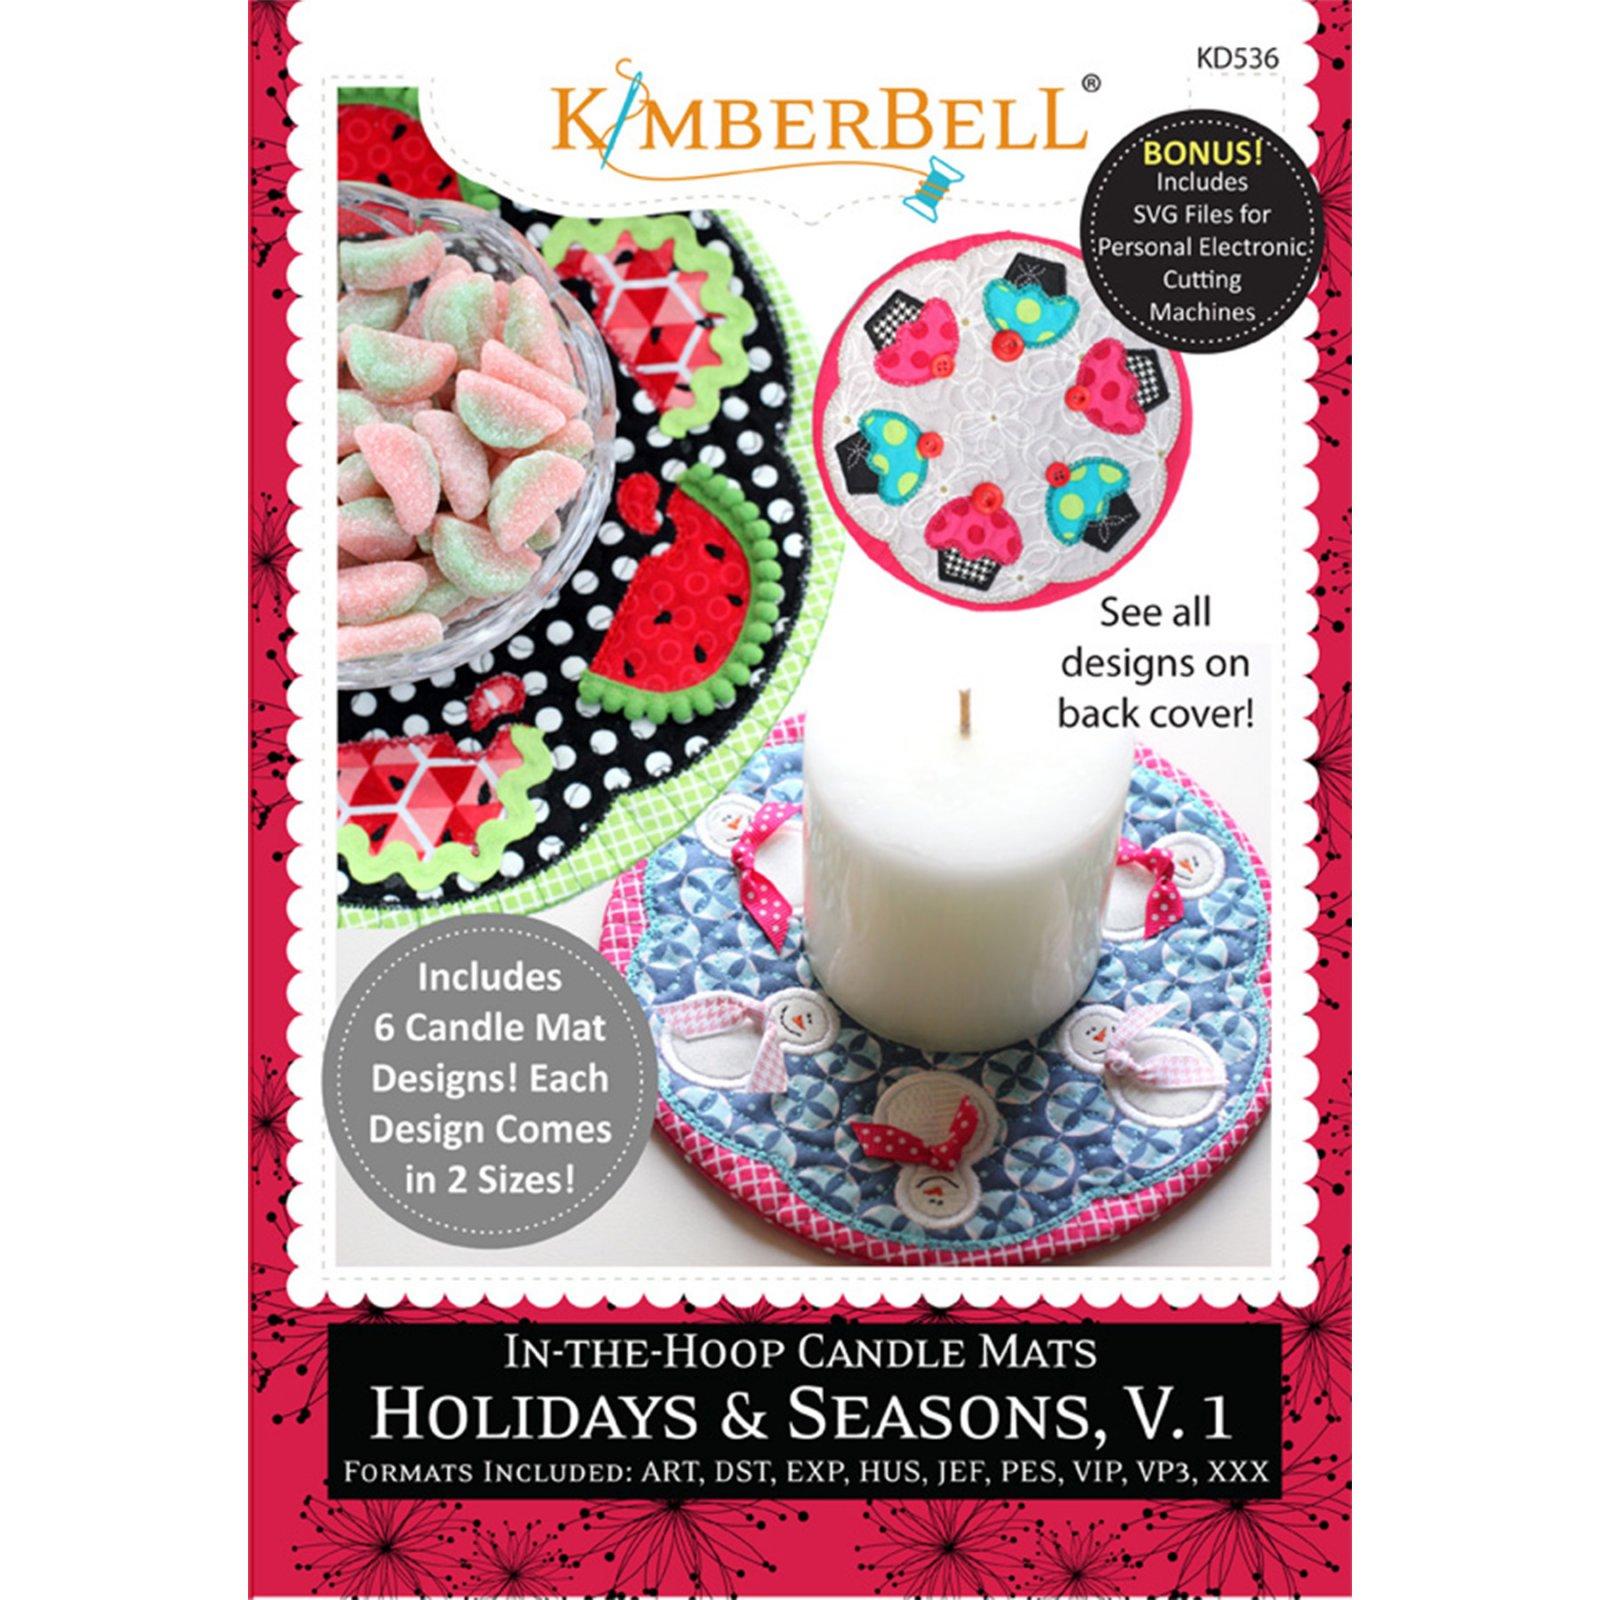 Candle Mats Holidays & Seasons Vol 1 Kimberbell Embroidery CD